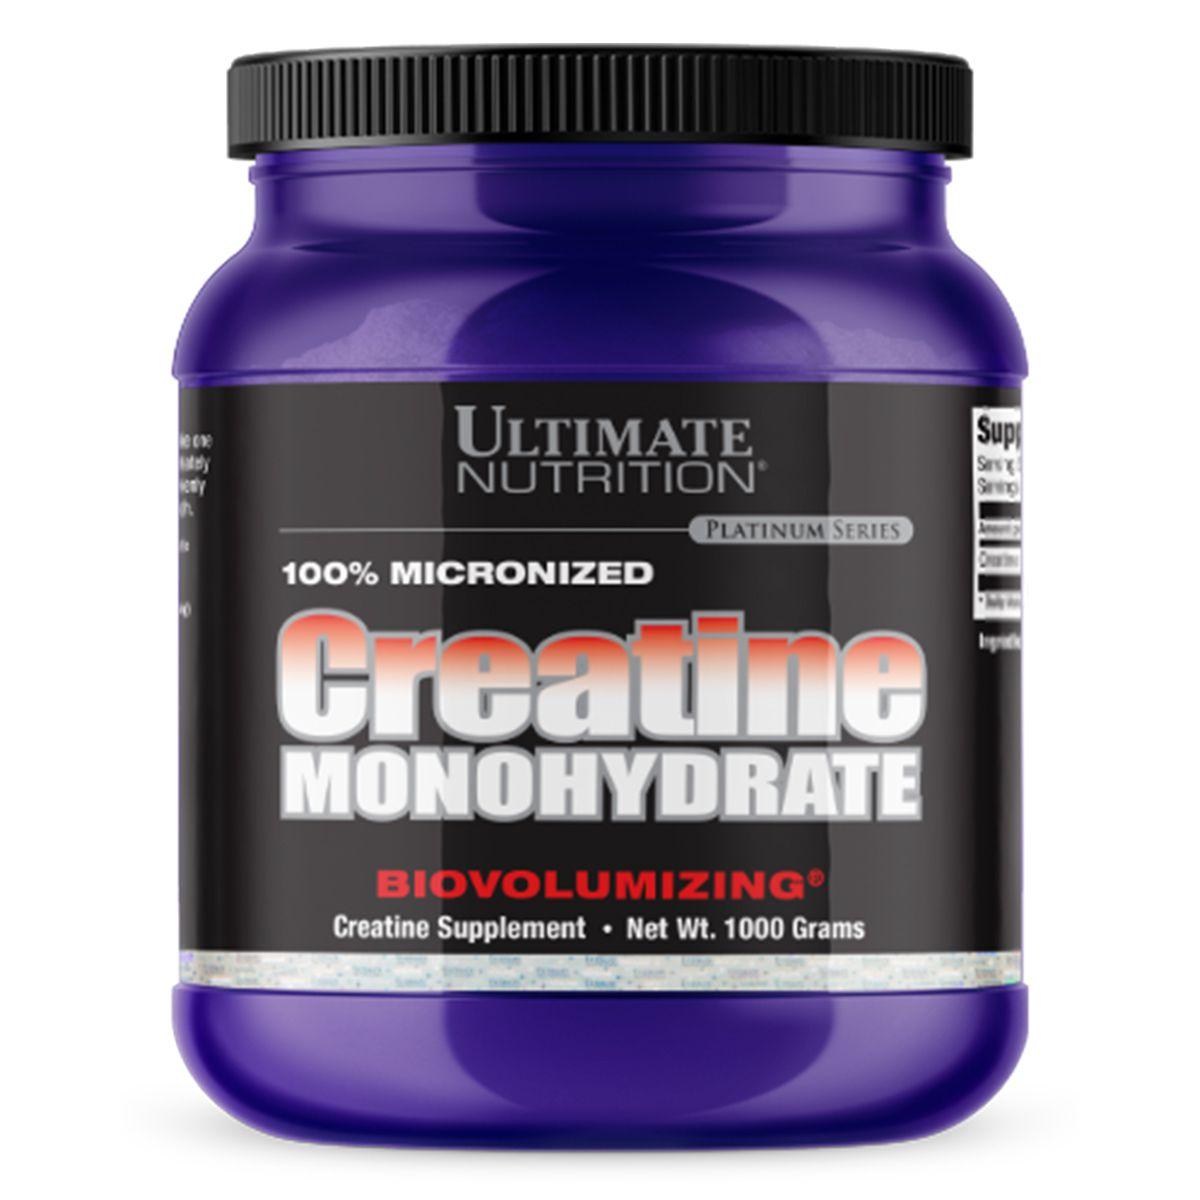 Creatine Monohydrate 1kg - Ultimate Nutrition